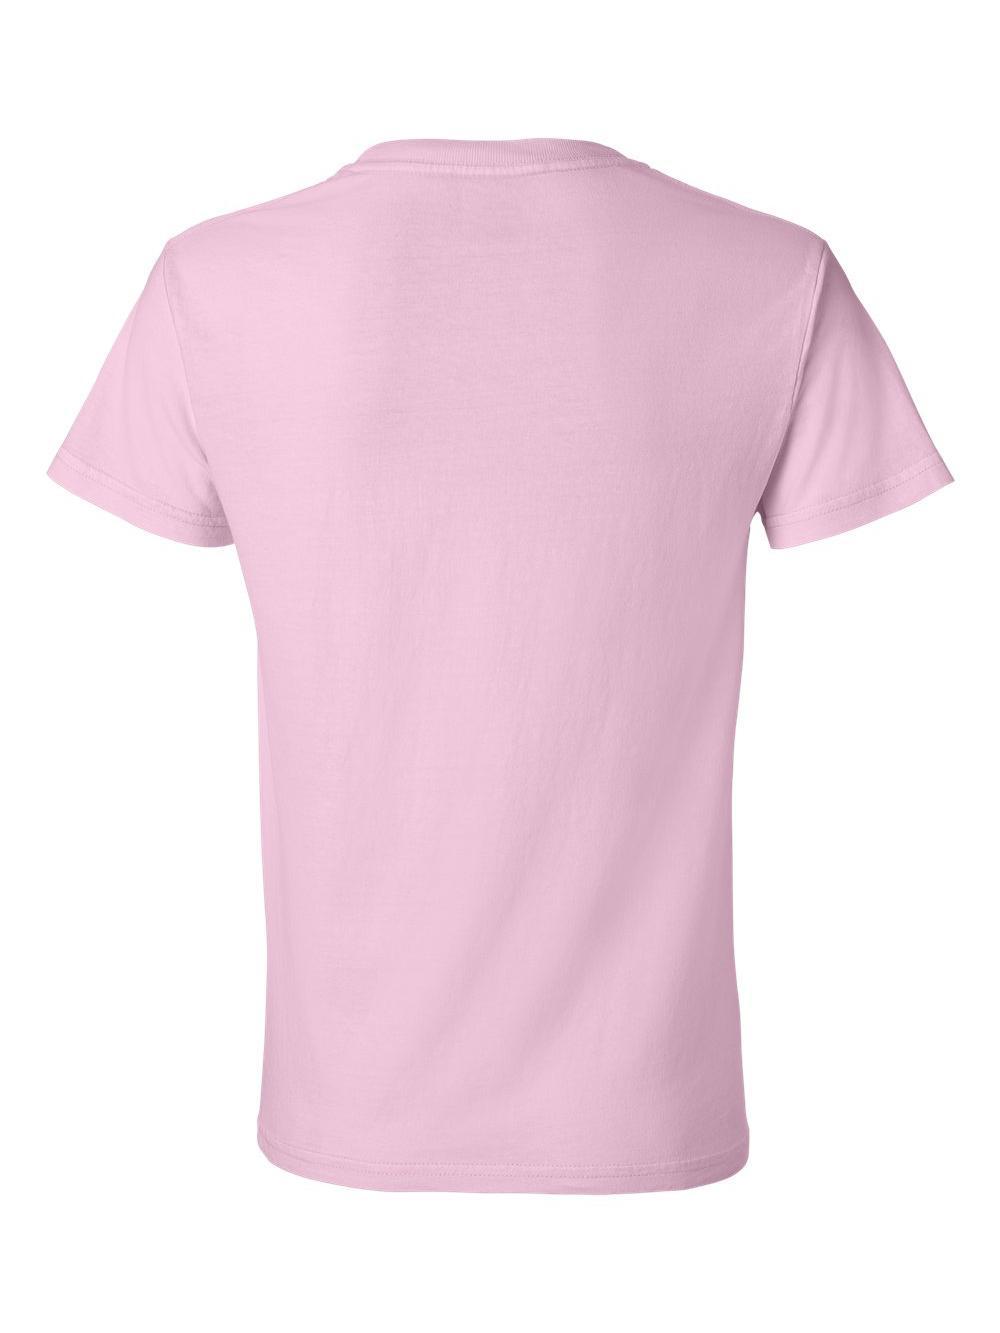 Comfort-Colors-Pigment-Dyed-Ringspun-Women-039-s-Short-Sleeve-T-Shirt-3333 thumbnail 4